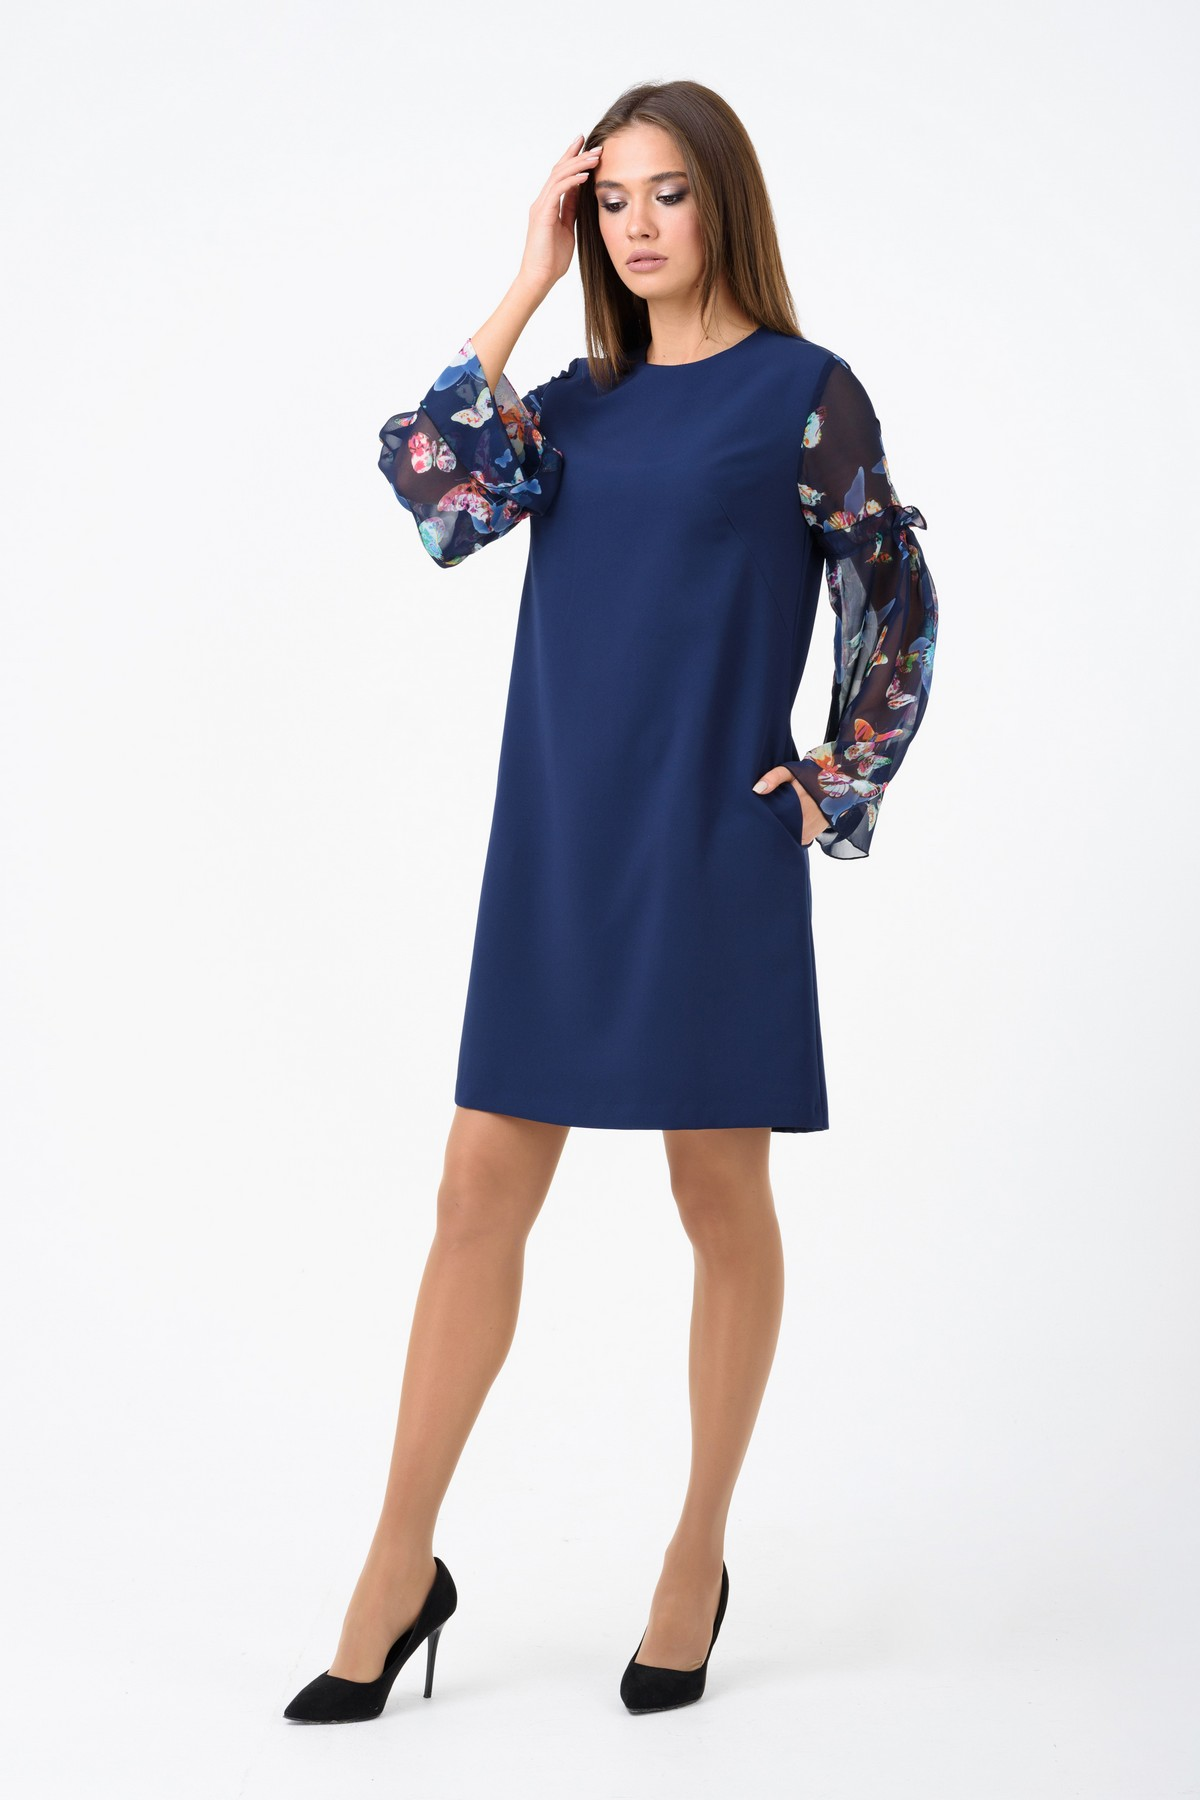 eb150fba011 Классическое платье А-силуэта RM1244-1-18VC